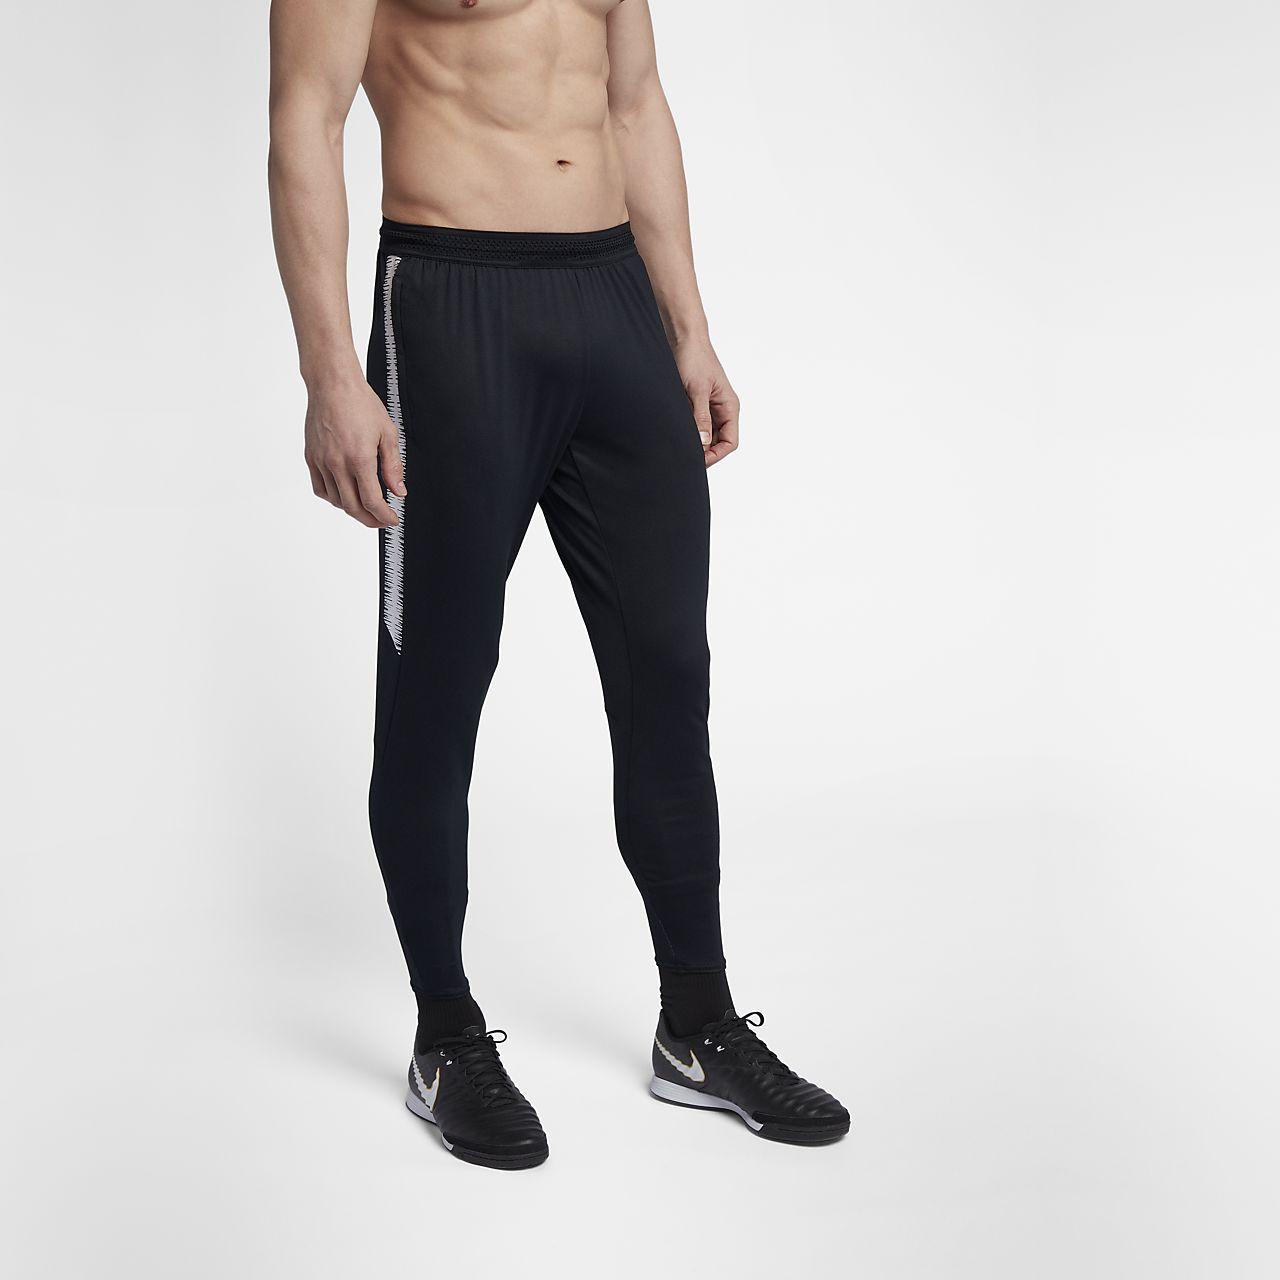 promo code ca573 c30d0 ... Nike Flex Strike Pantalón de fútbol - Hombre